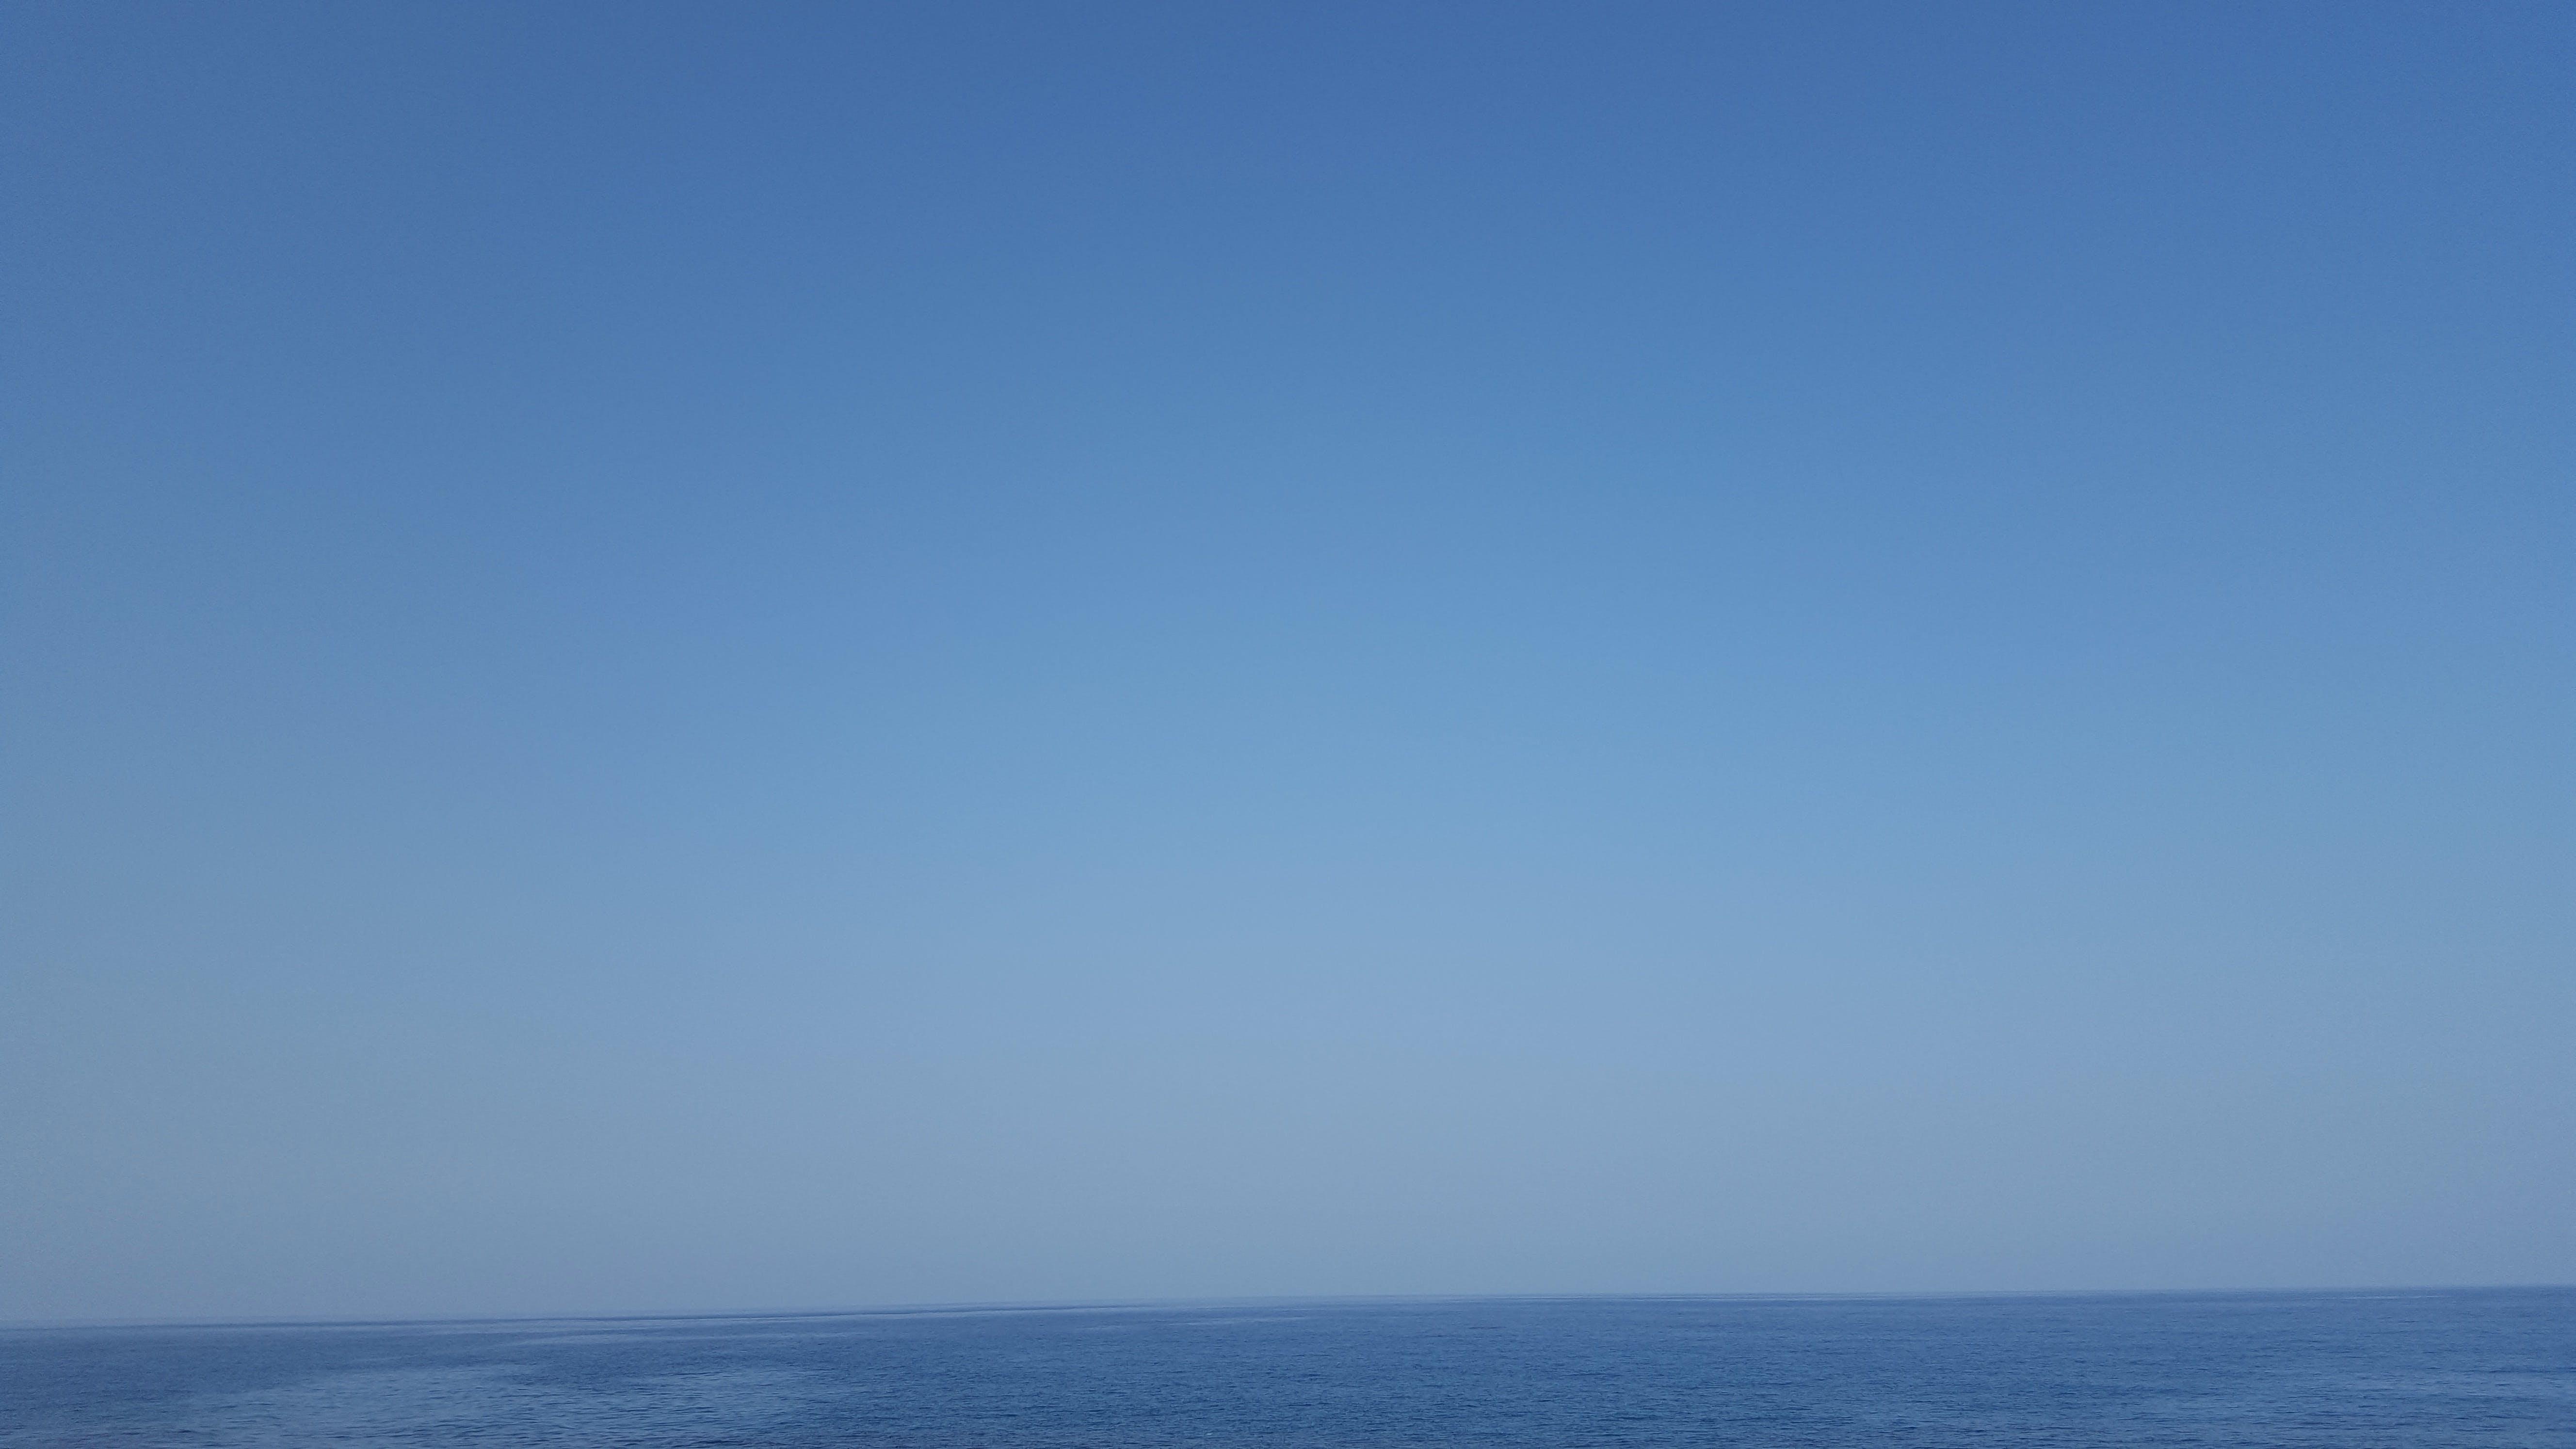 Free stock photo of blue sea, clear sky, sea, sky